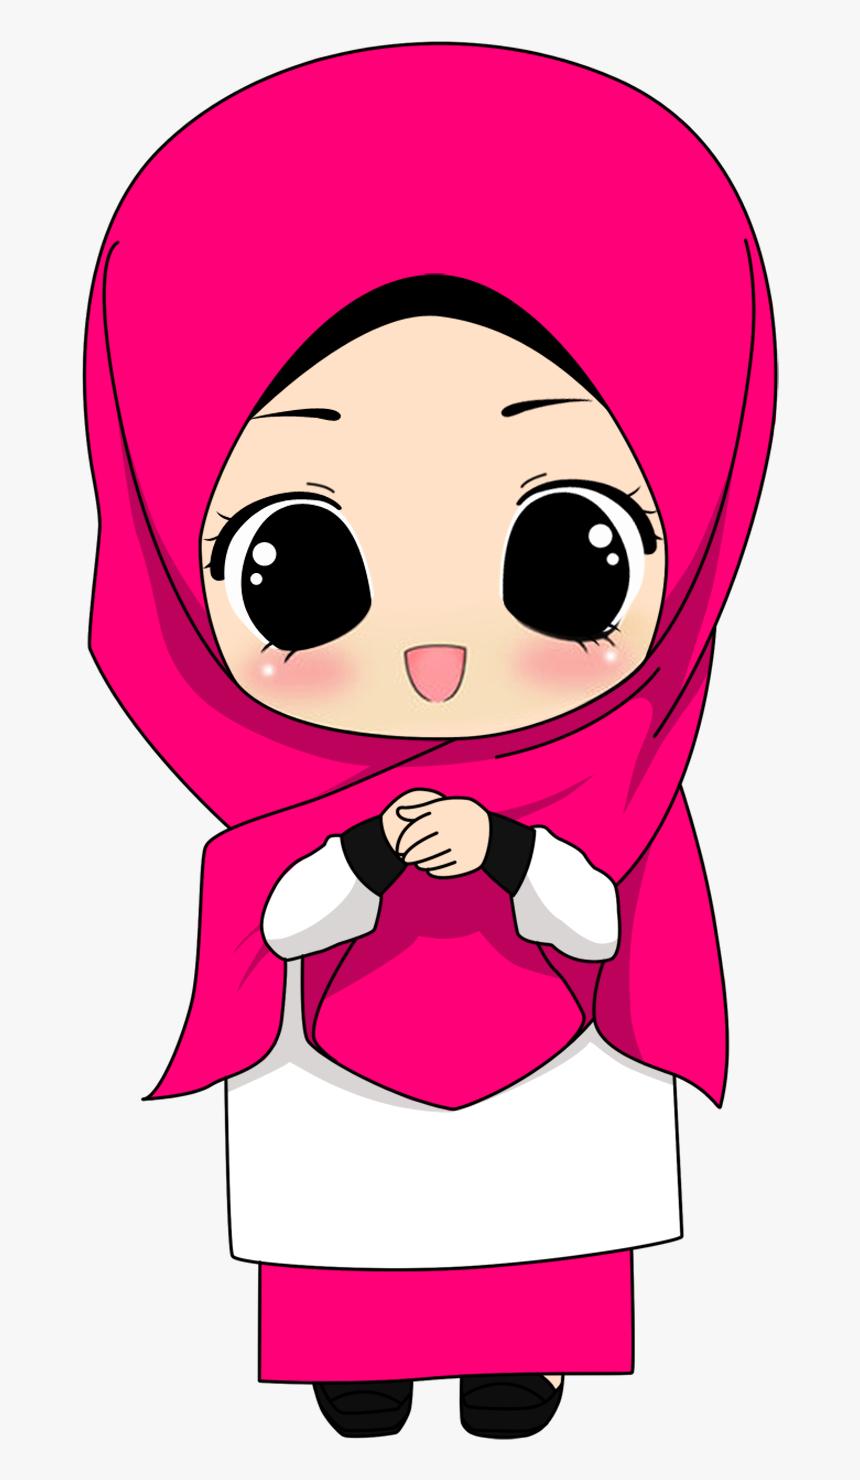 Gambar Kartun Muslimah Png 1 Png Image Hijab Cartoon Png Transparent Png Transparent Png Image Pngitem